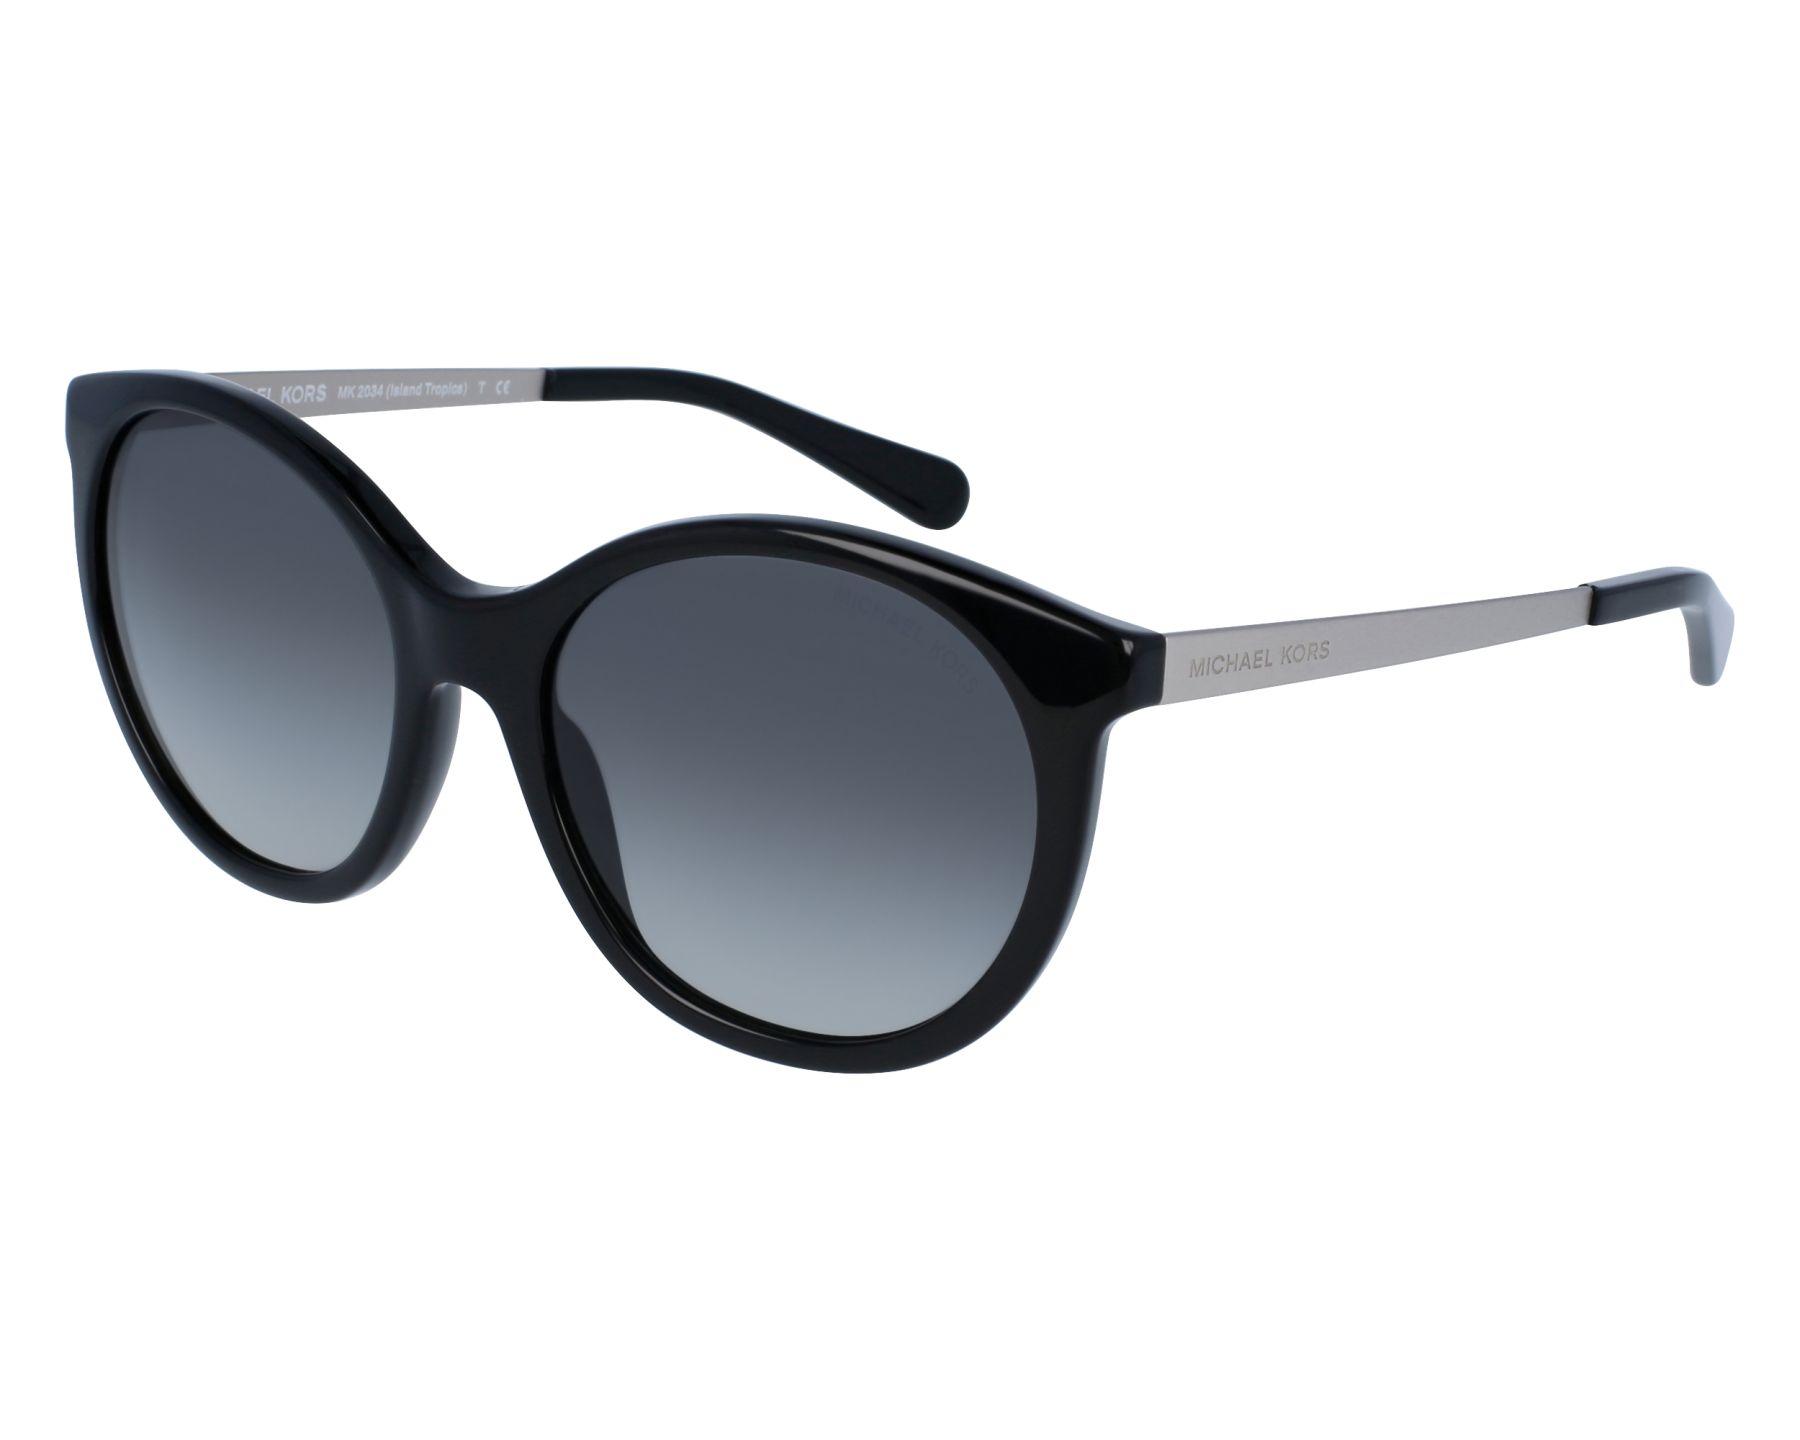 c269ab27e5 Sunglasses Michael Kors MK-2034 320411 55-18 Black Silver front view